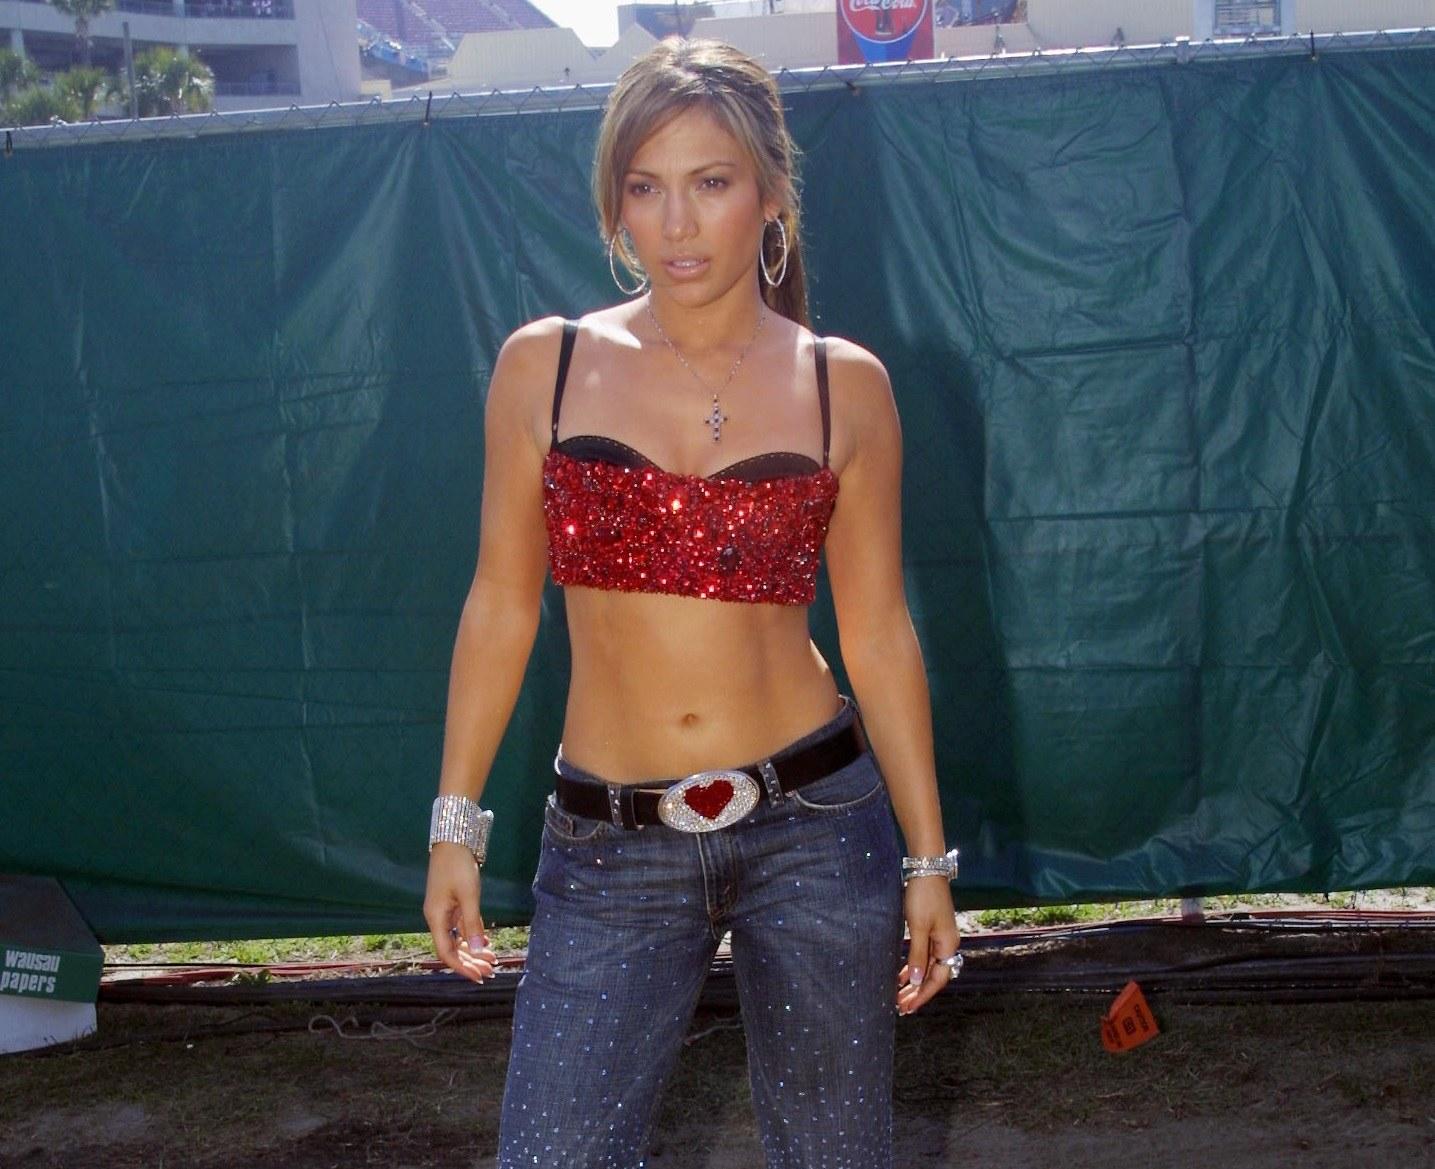 Jennifer Lopez backstage before MTV's TRL on Superbowl Sunday at Raymond James Stadium in Tampa, Florida on Jan. 28, 2001.